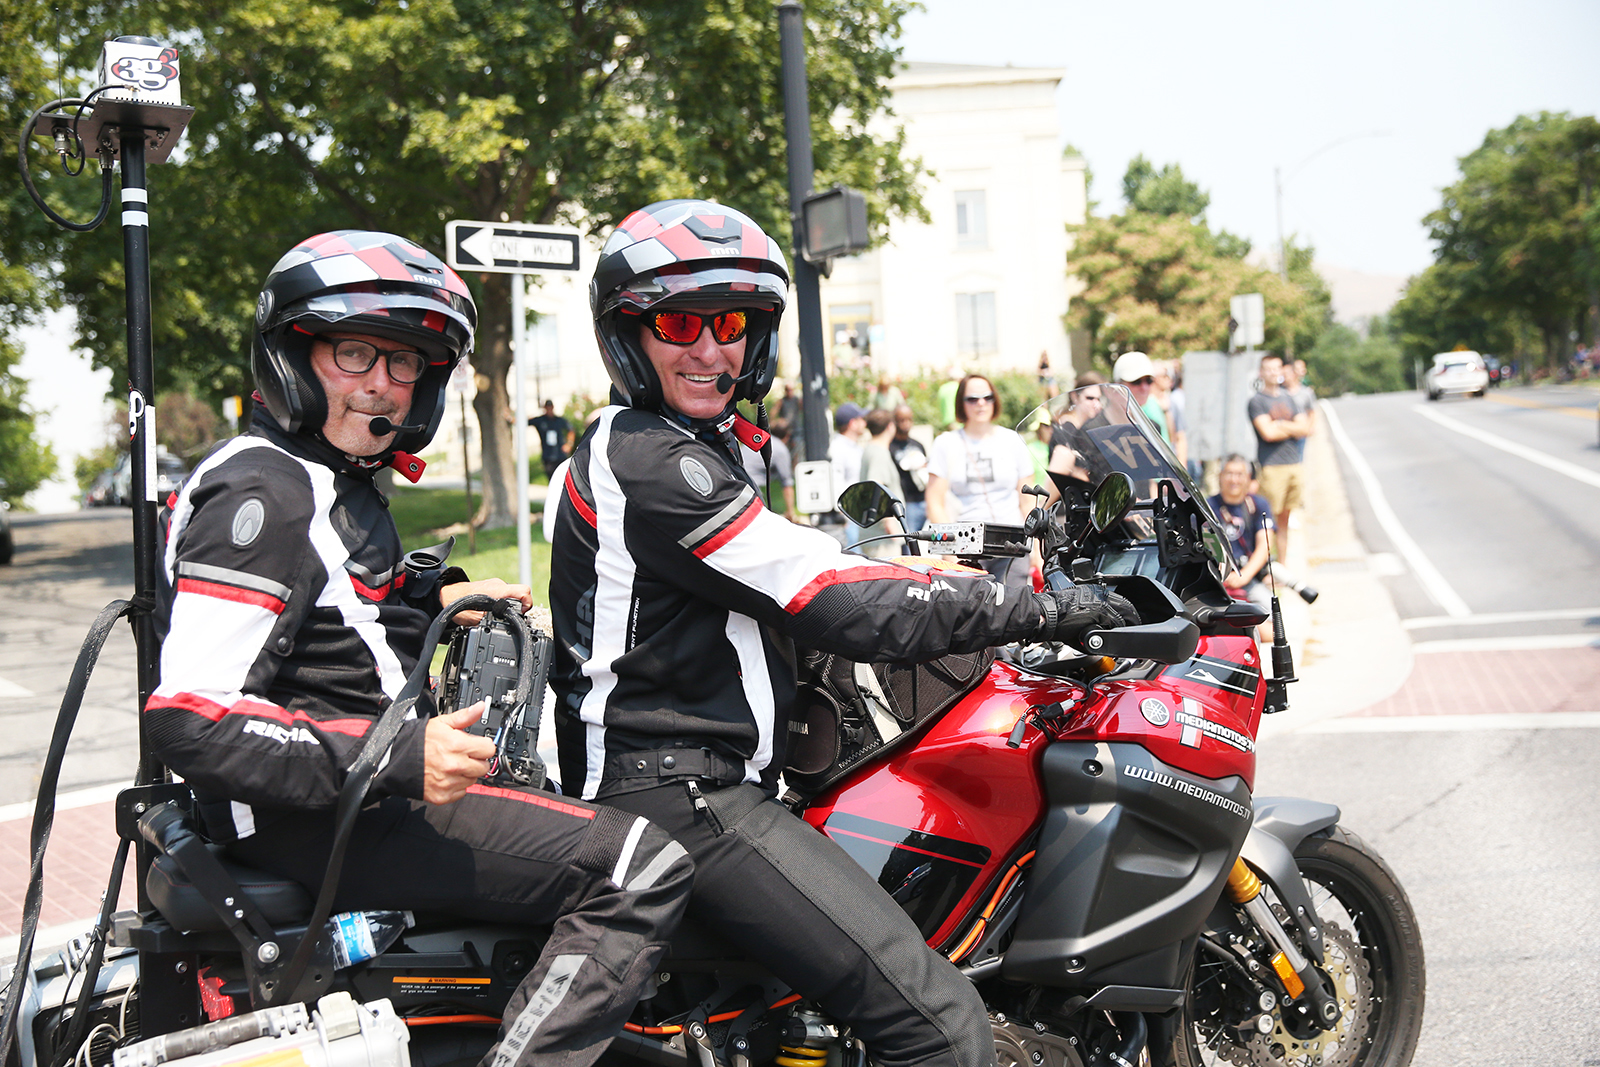 Video crew. 2018 Tour of Utah Stage 4, August 8, 2018, Salt Lake City, Utah. Photo by Cathy Fegan-Kim, cottonsoxphotography.net